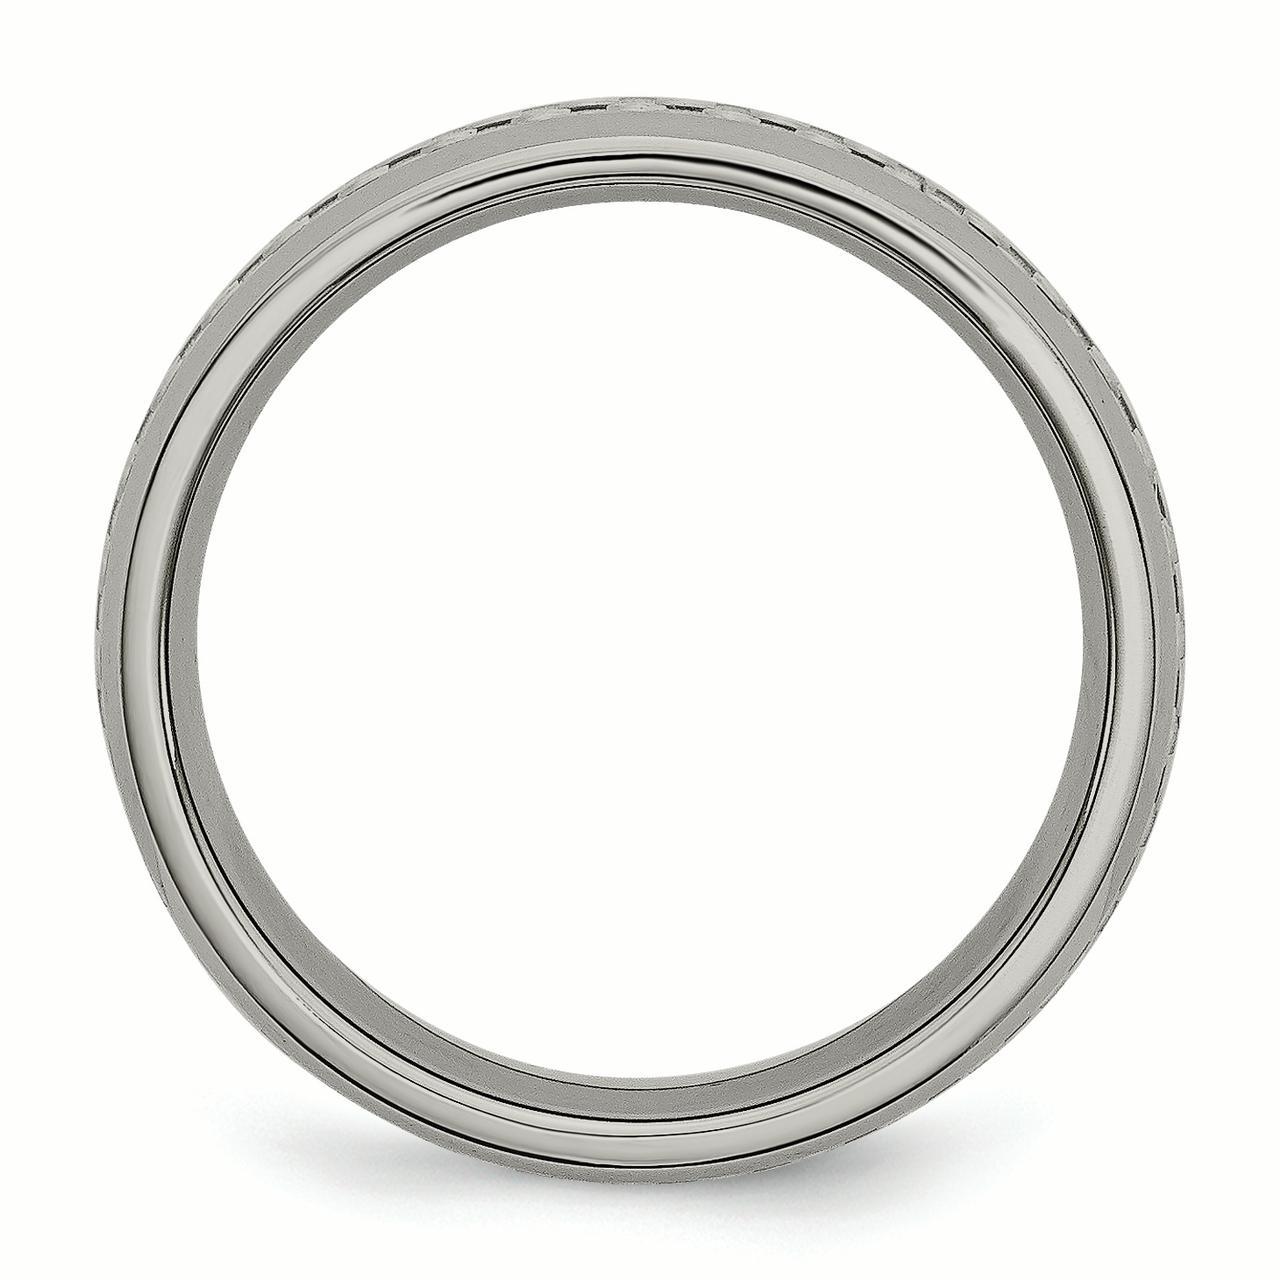 Box Titanium /& Grey Carbon Fiber 6mm Polished Band